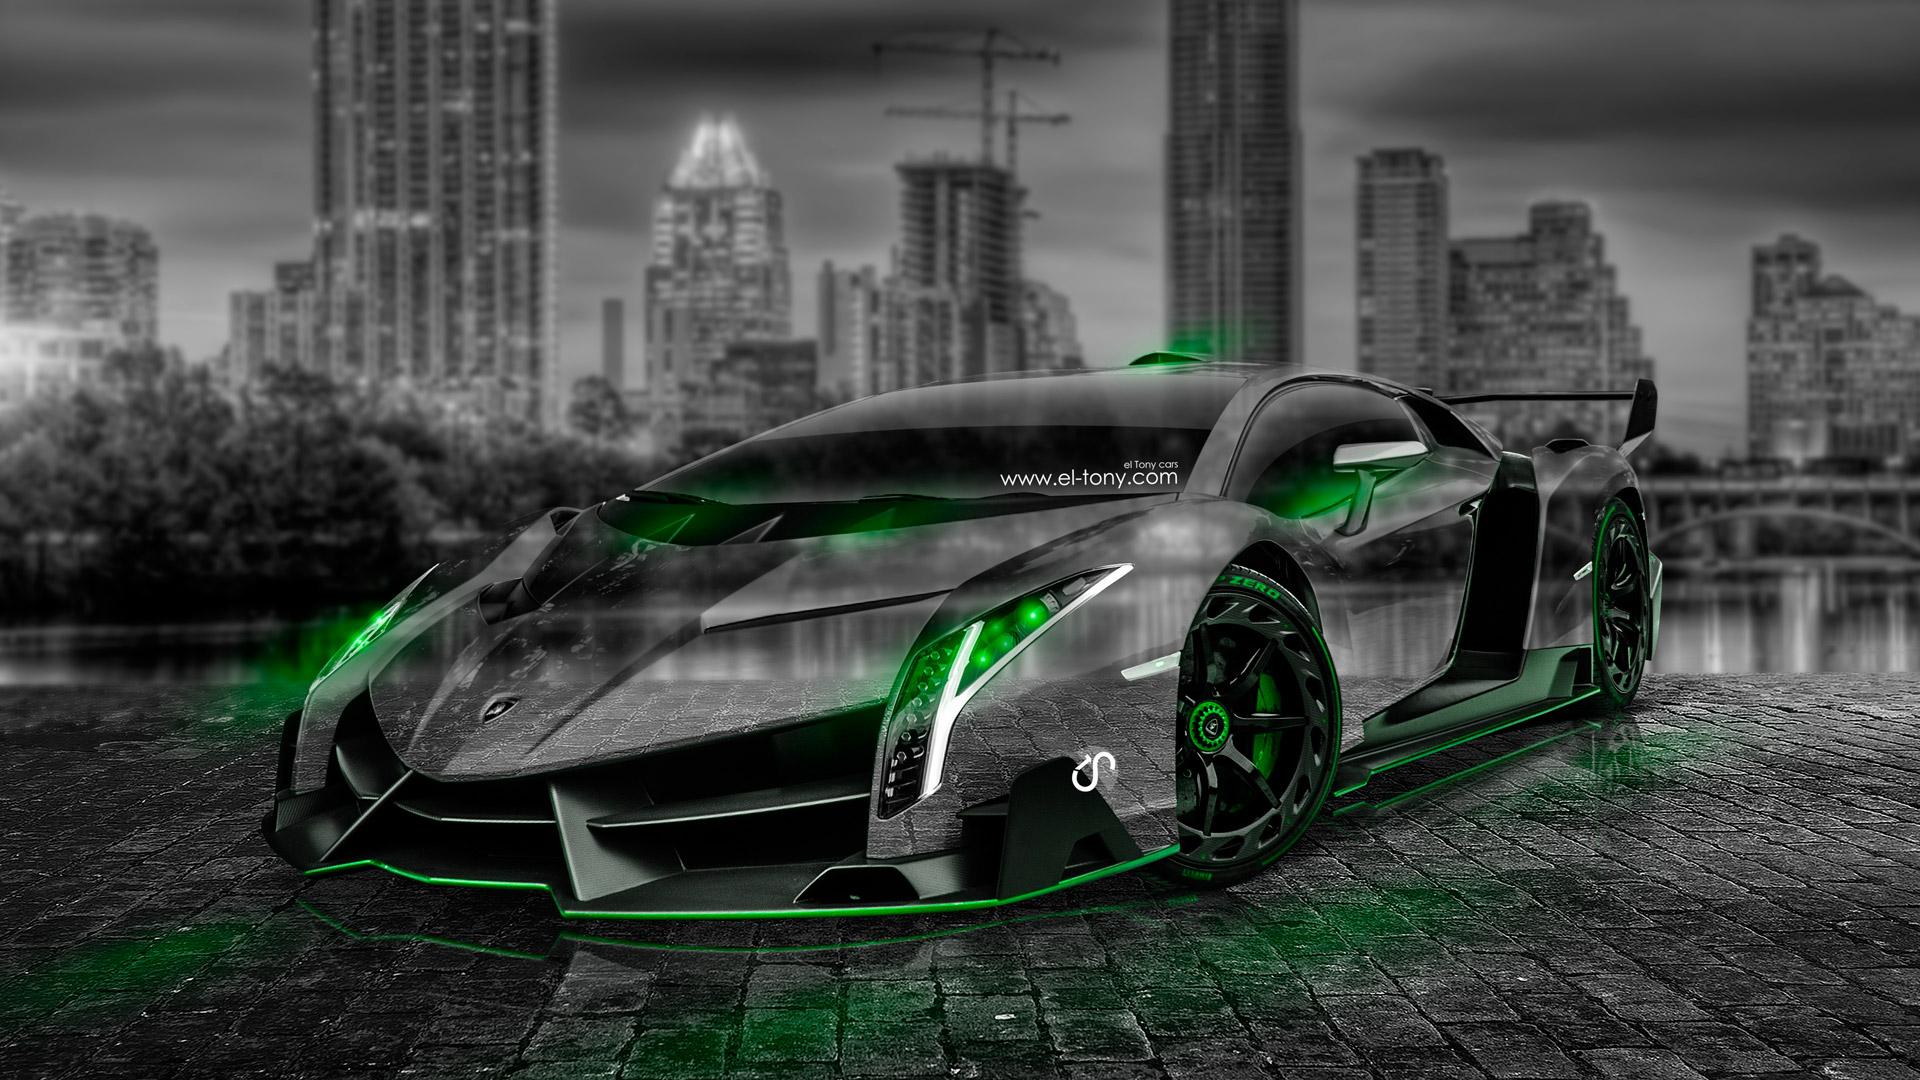 Lamborghini Veneno Wallpaper (53 Wallpapers) – Adorable ...